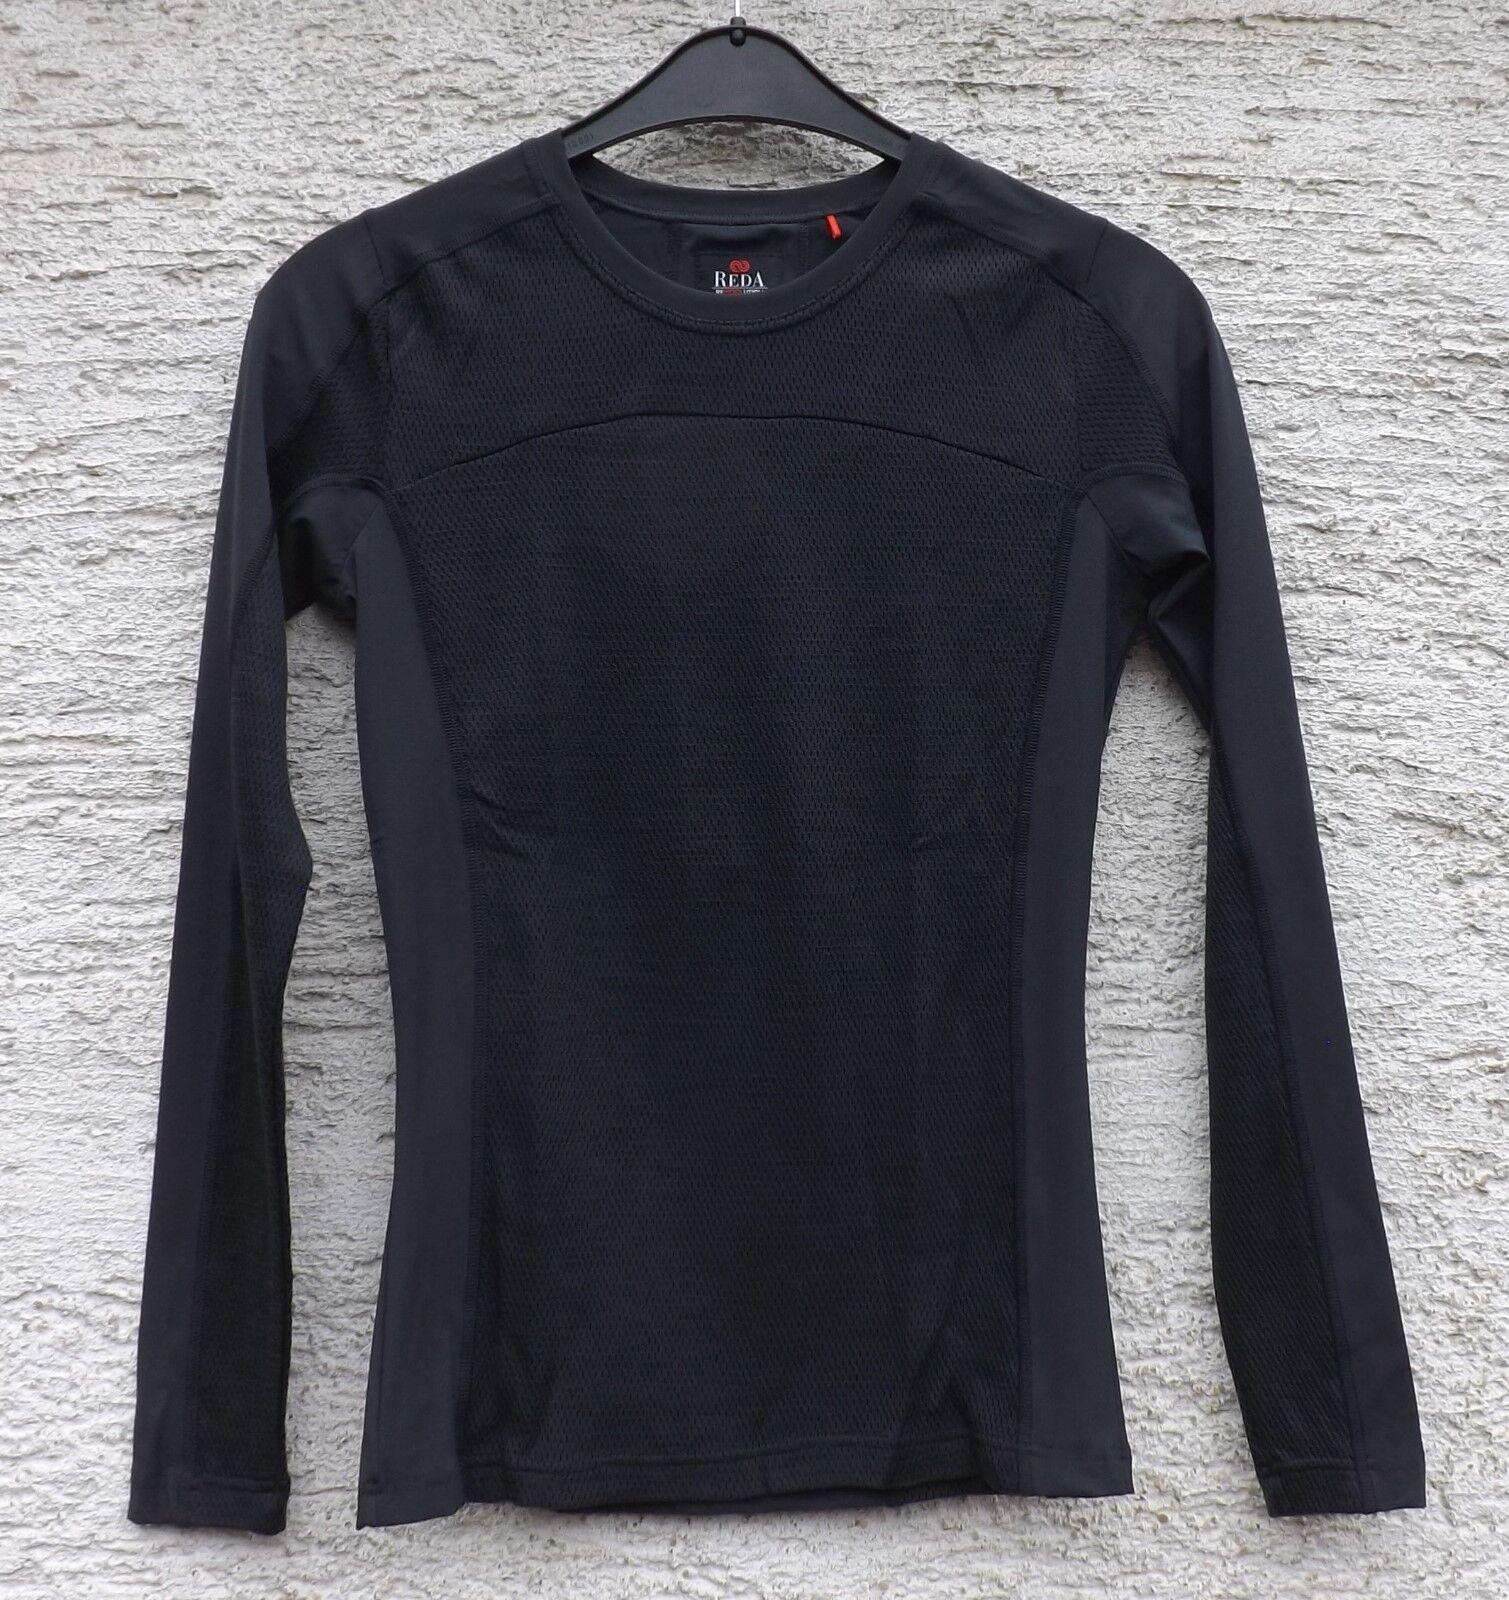 rojoA Rewoolution Altair para hombre malla sensible camisa de manga larga de lana Merino